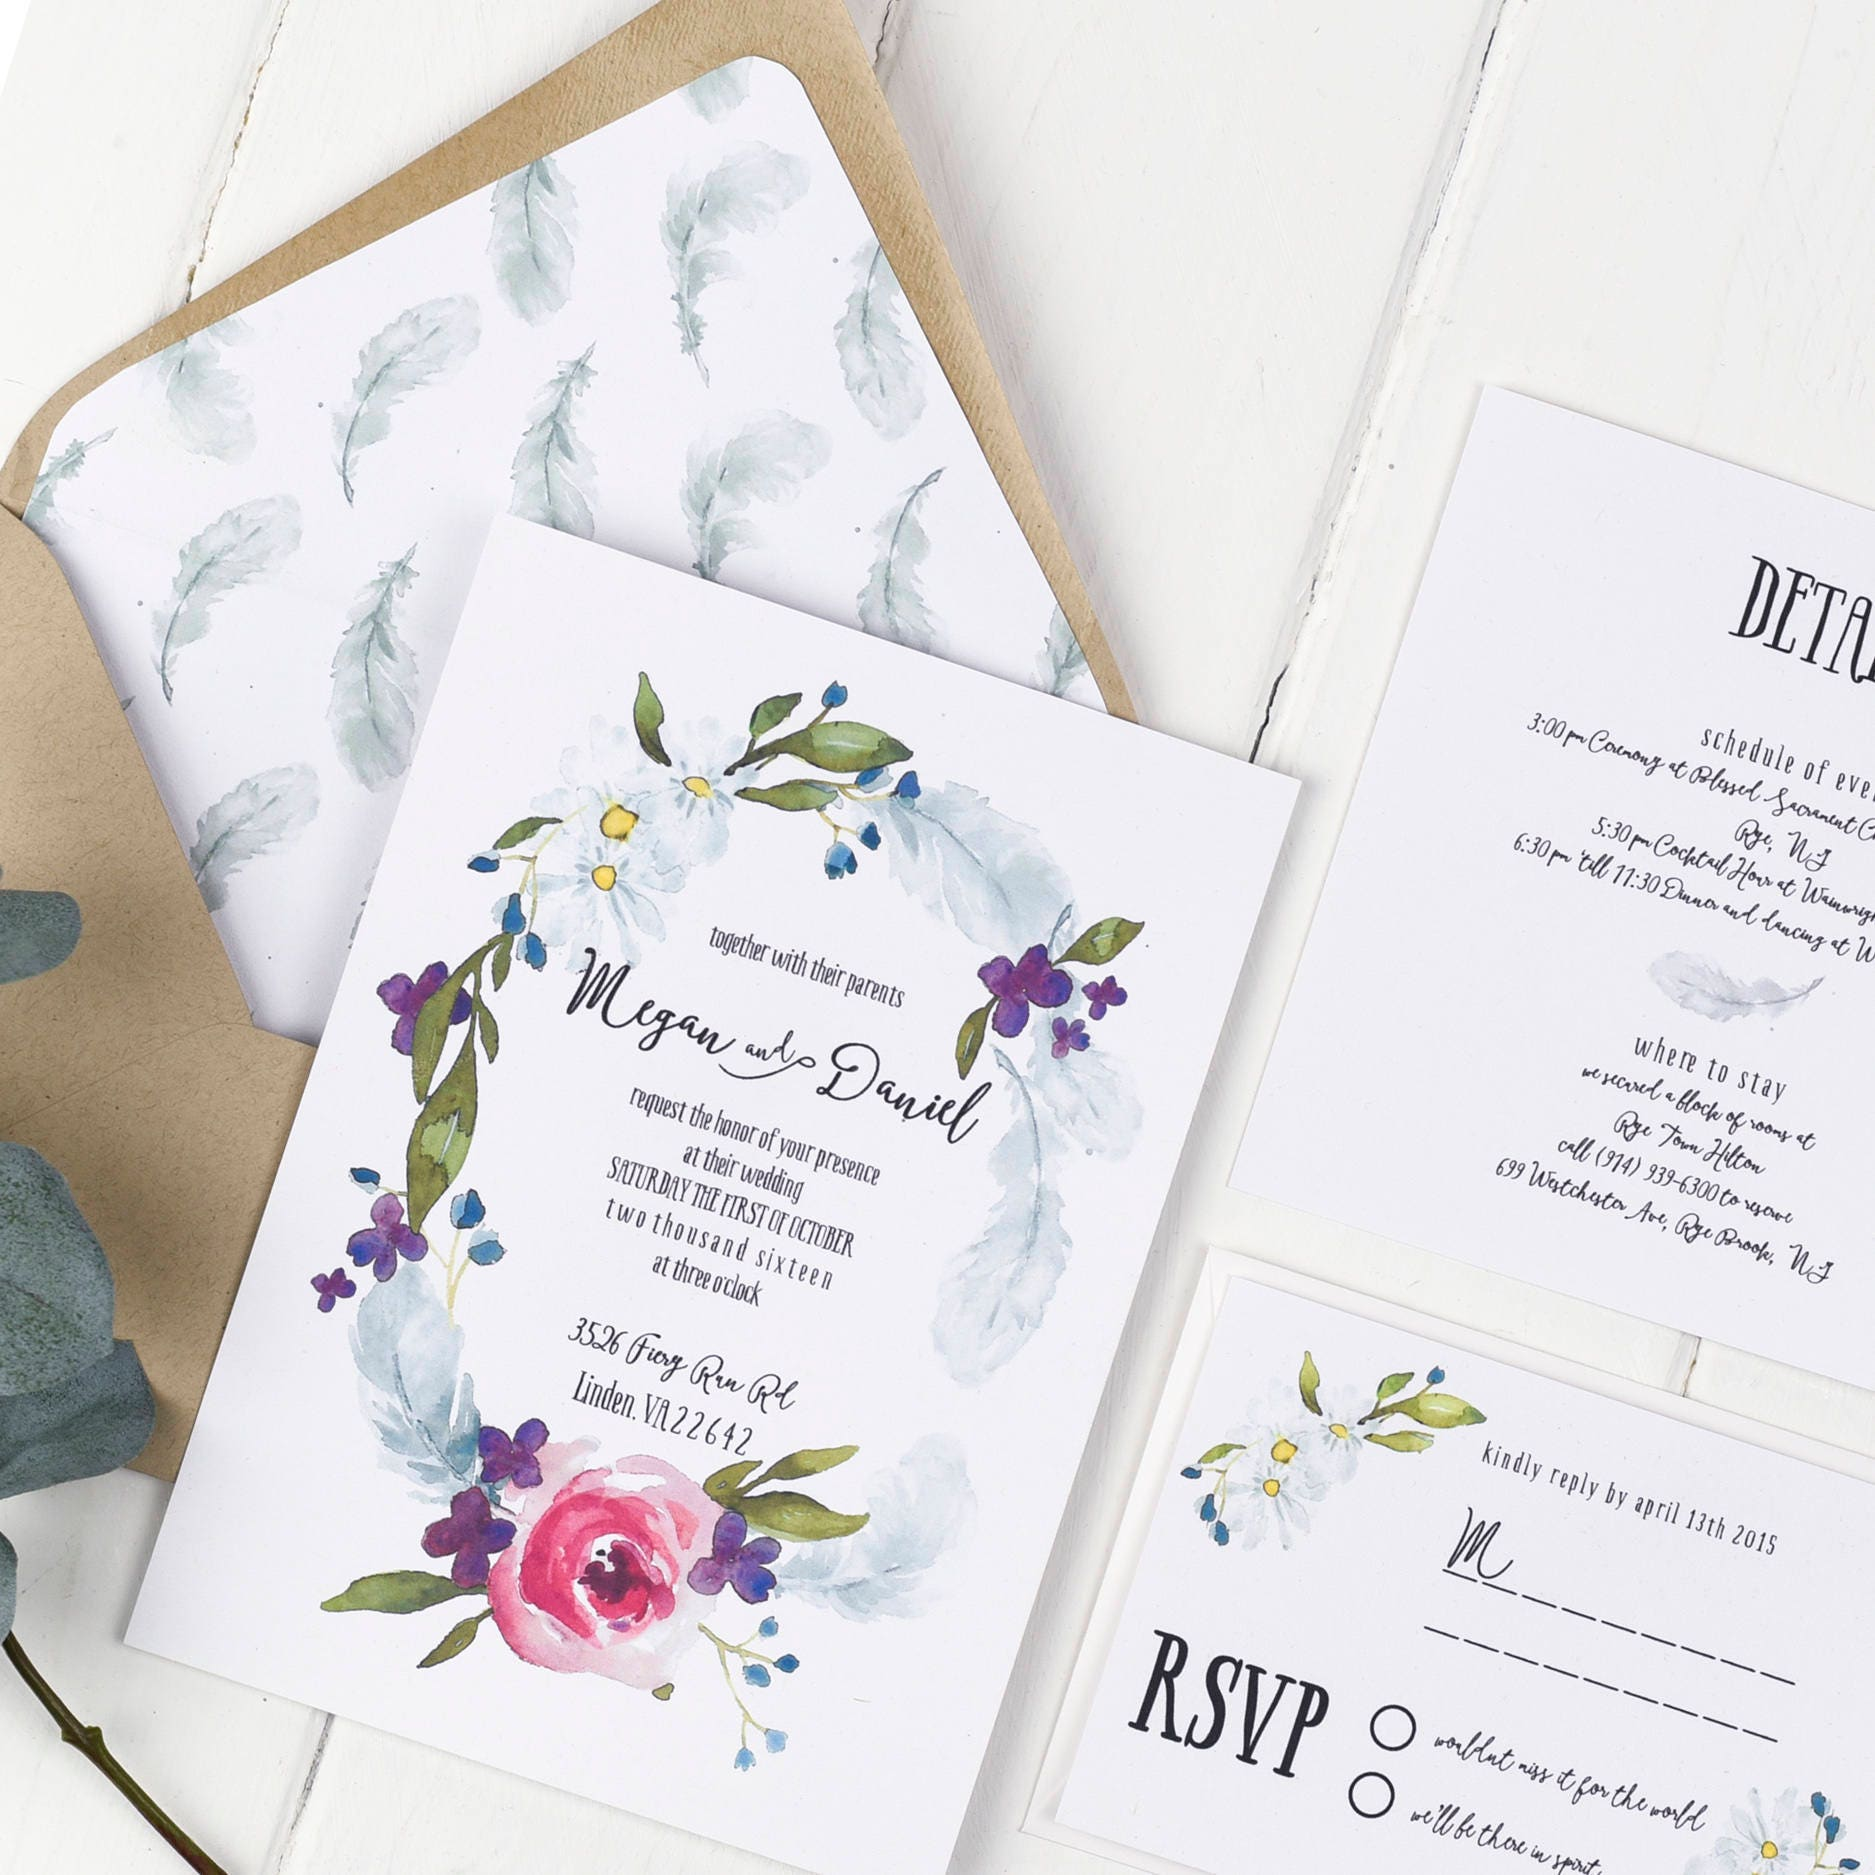 Bohemian Wedding Invitations: Boho Wedding Invitation Wedding Invitation Boho Bohemian